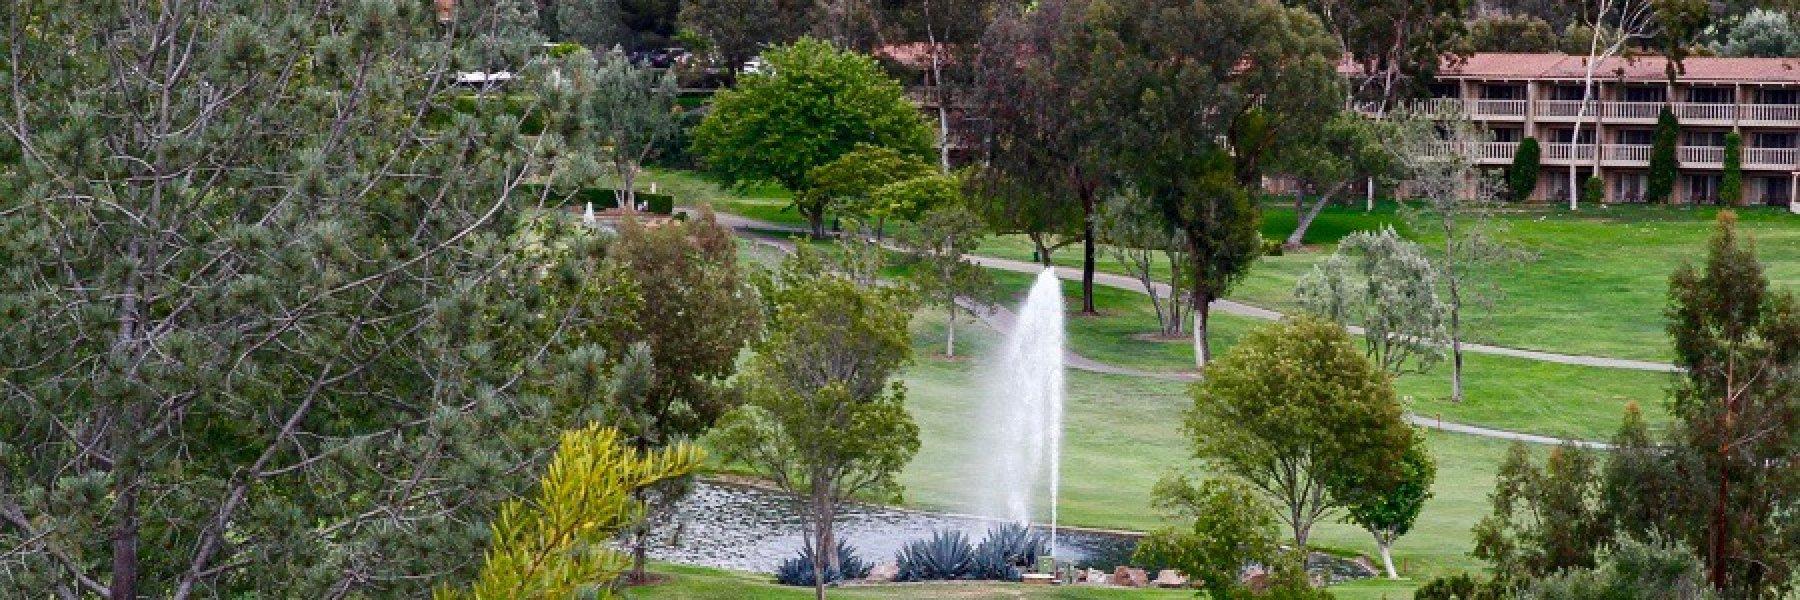 Eastview is a community of homes in Rancho Bernardo California